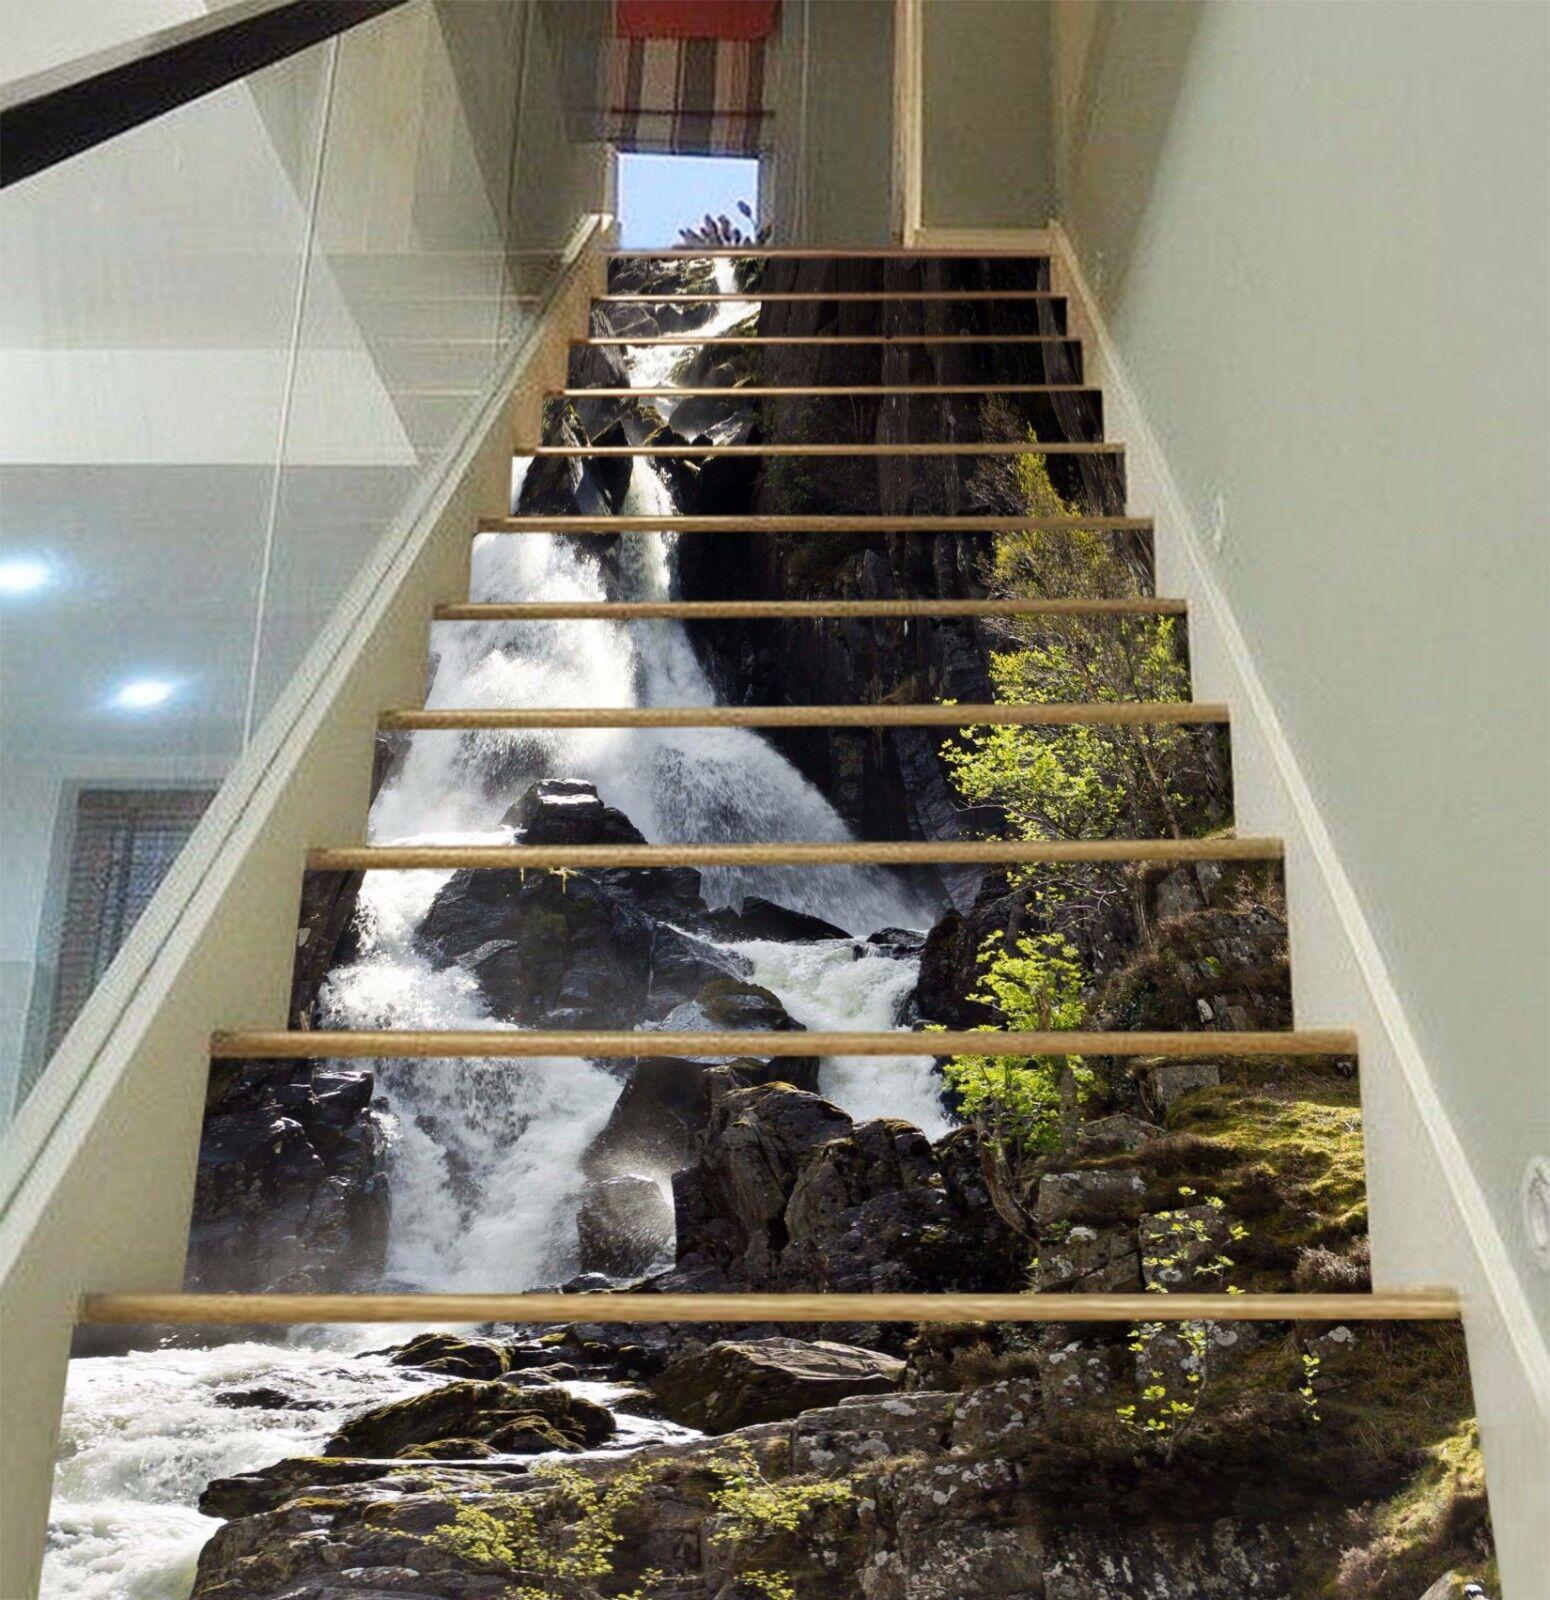 3D Strom Baum 7588 Stair Risers Dekoration Fototapete Vinyl Aufkleber Tapete DE